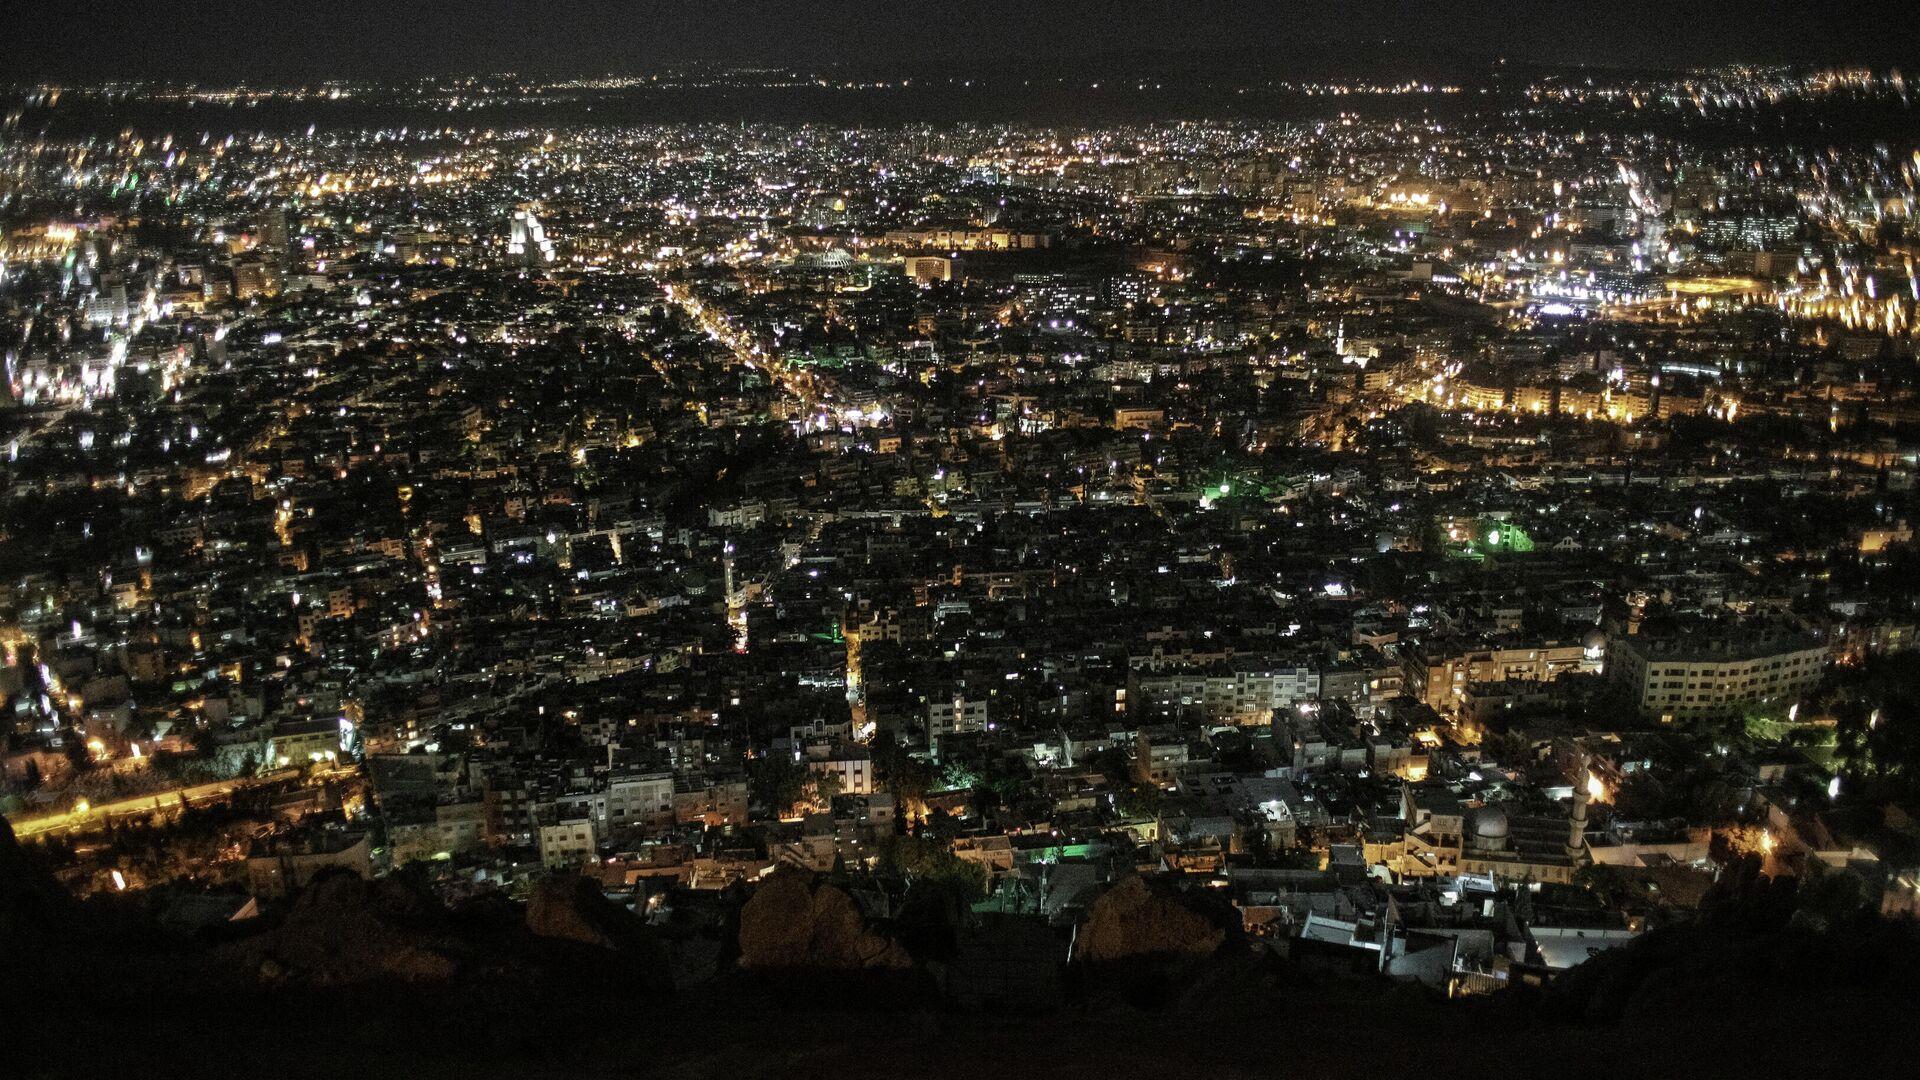 Damaskus (Symbolbild) - SNA, 1920, 19.09.2021